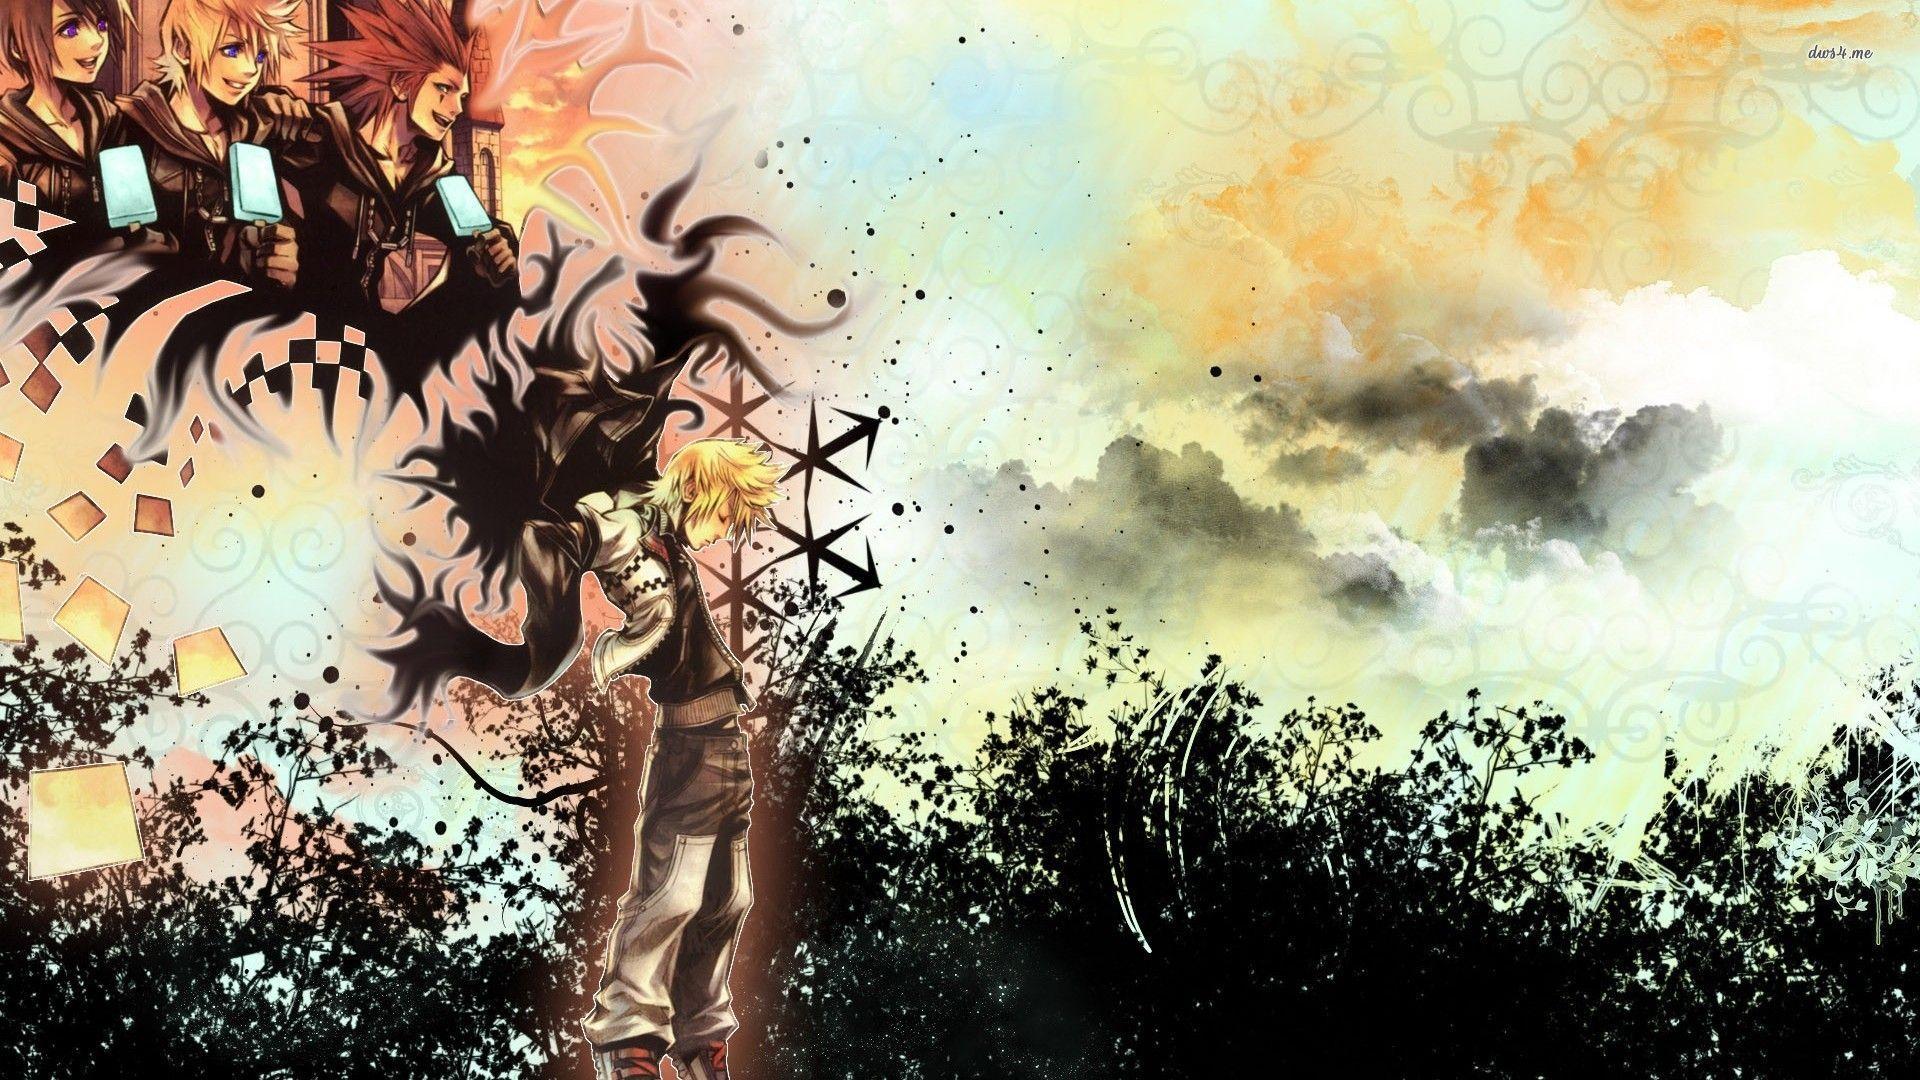 Kingdom Hearts Roxas Wallpapers Hd 1080p